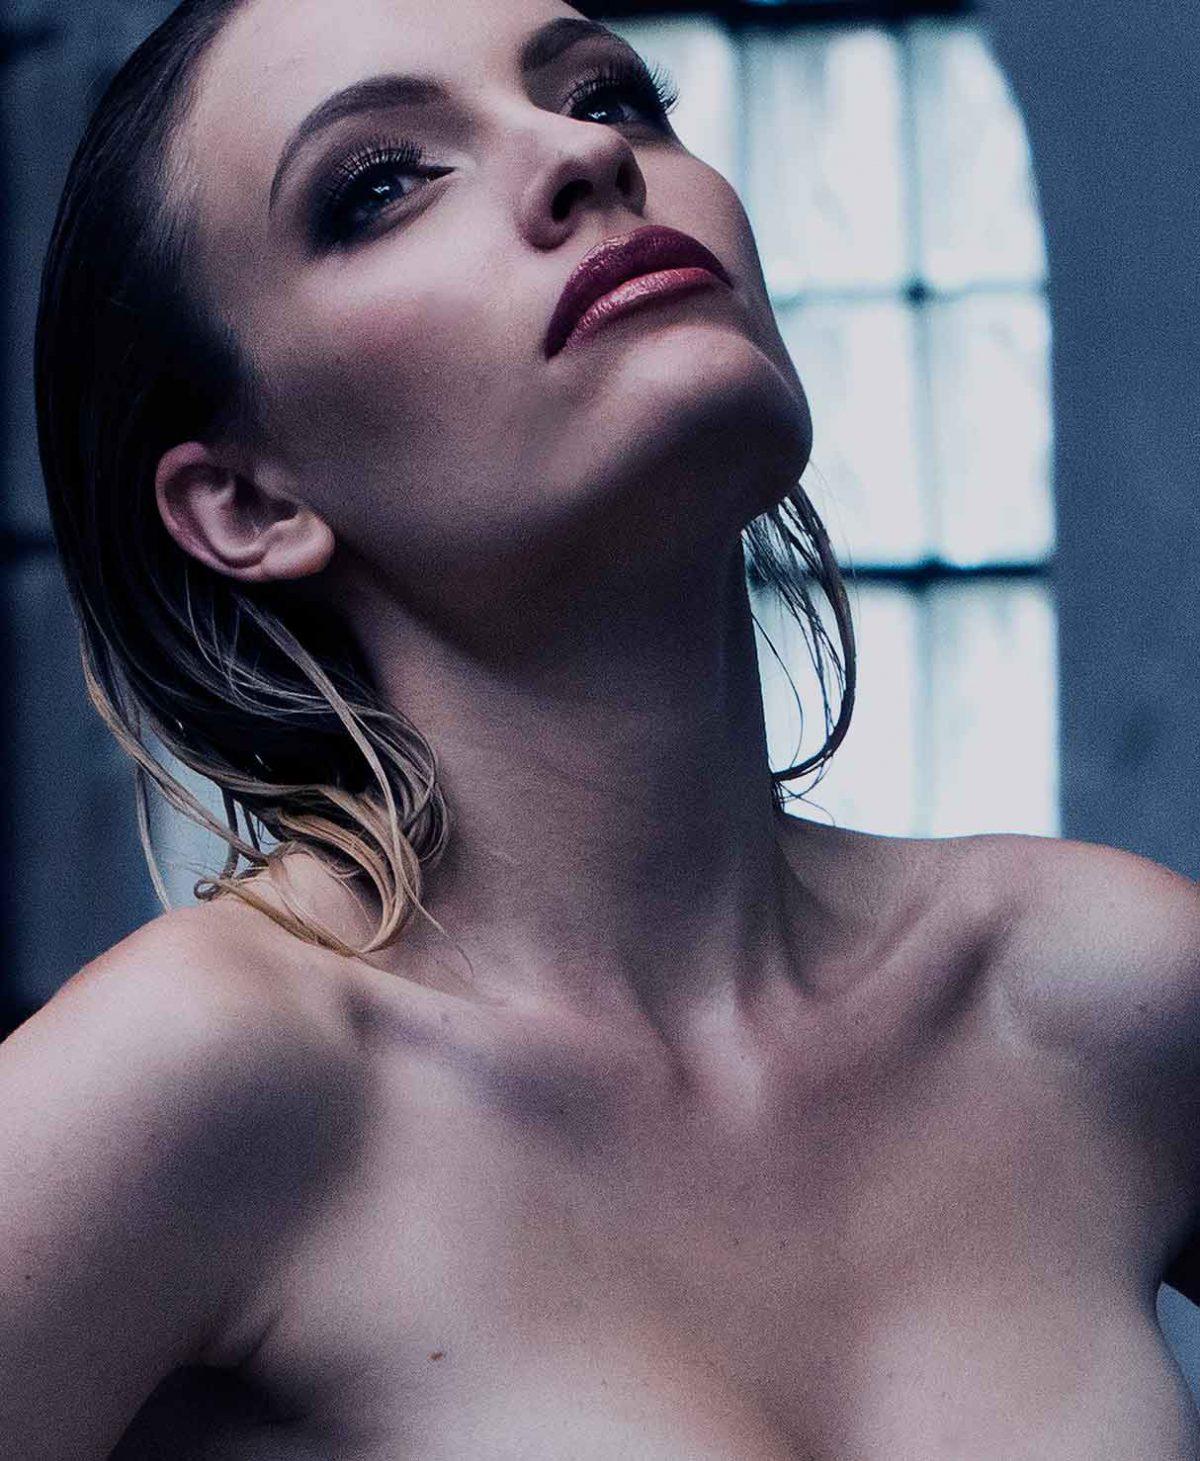 Beauty Fotografie von Philip Poe, Ludwigsburg